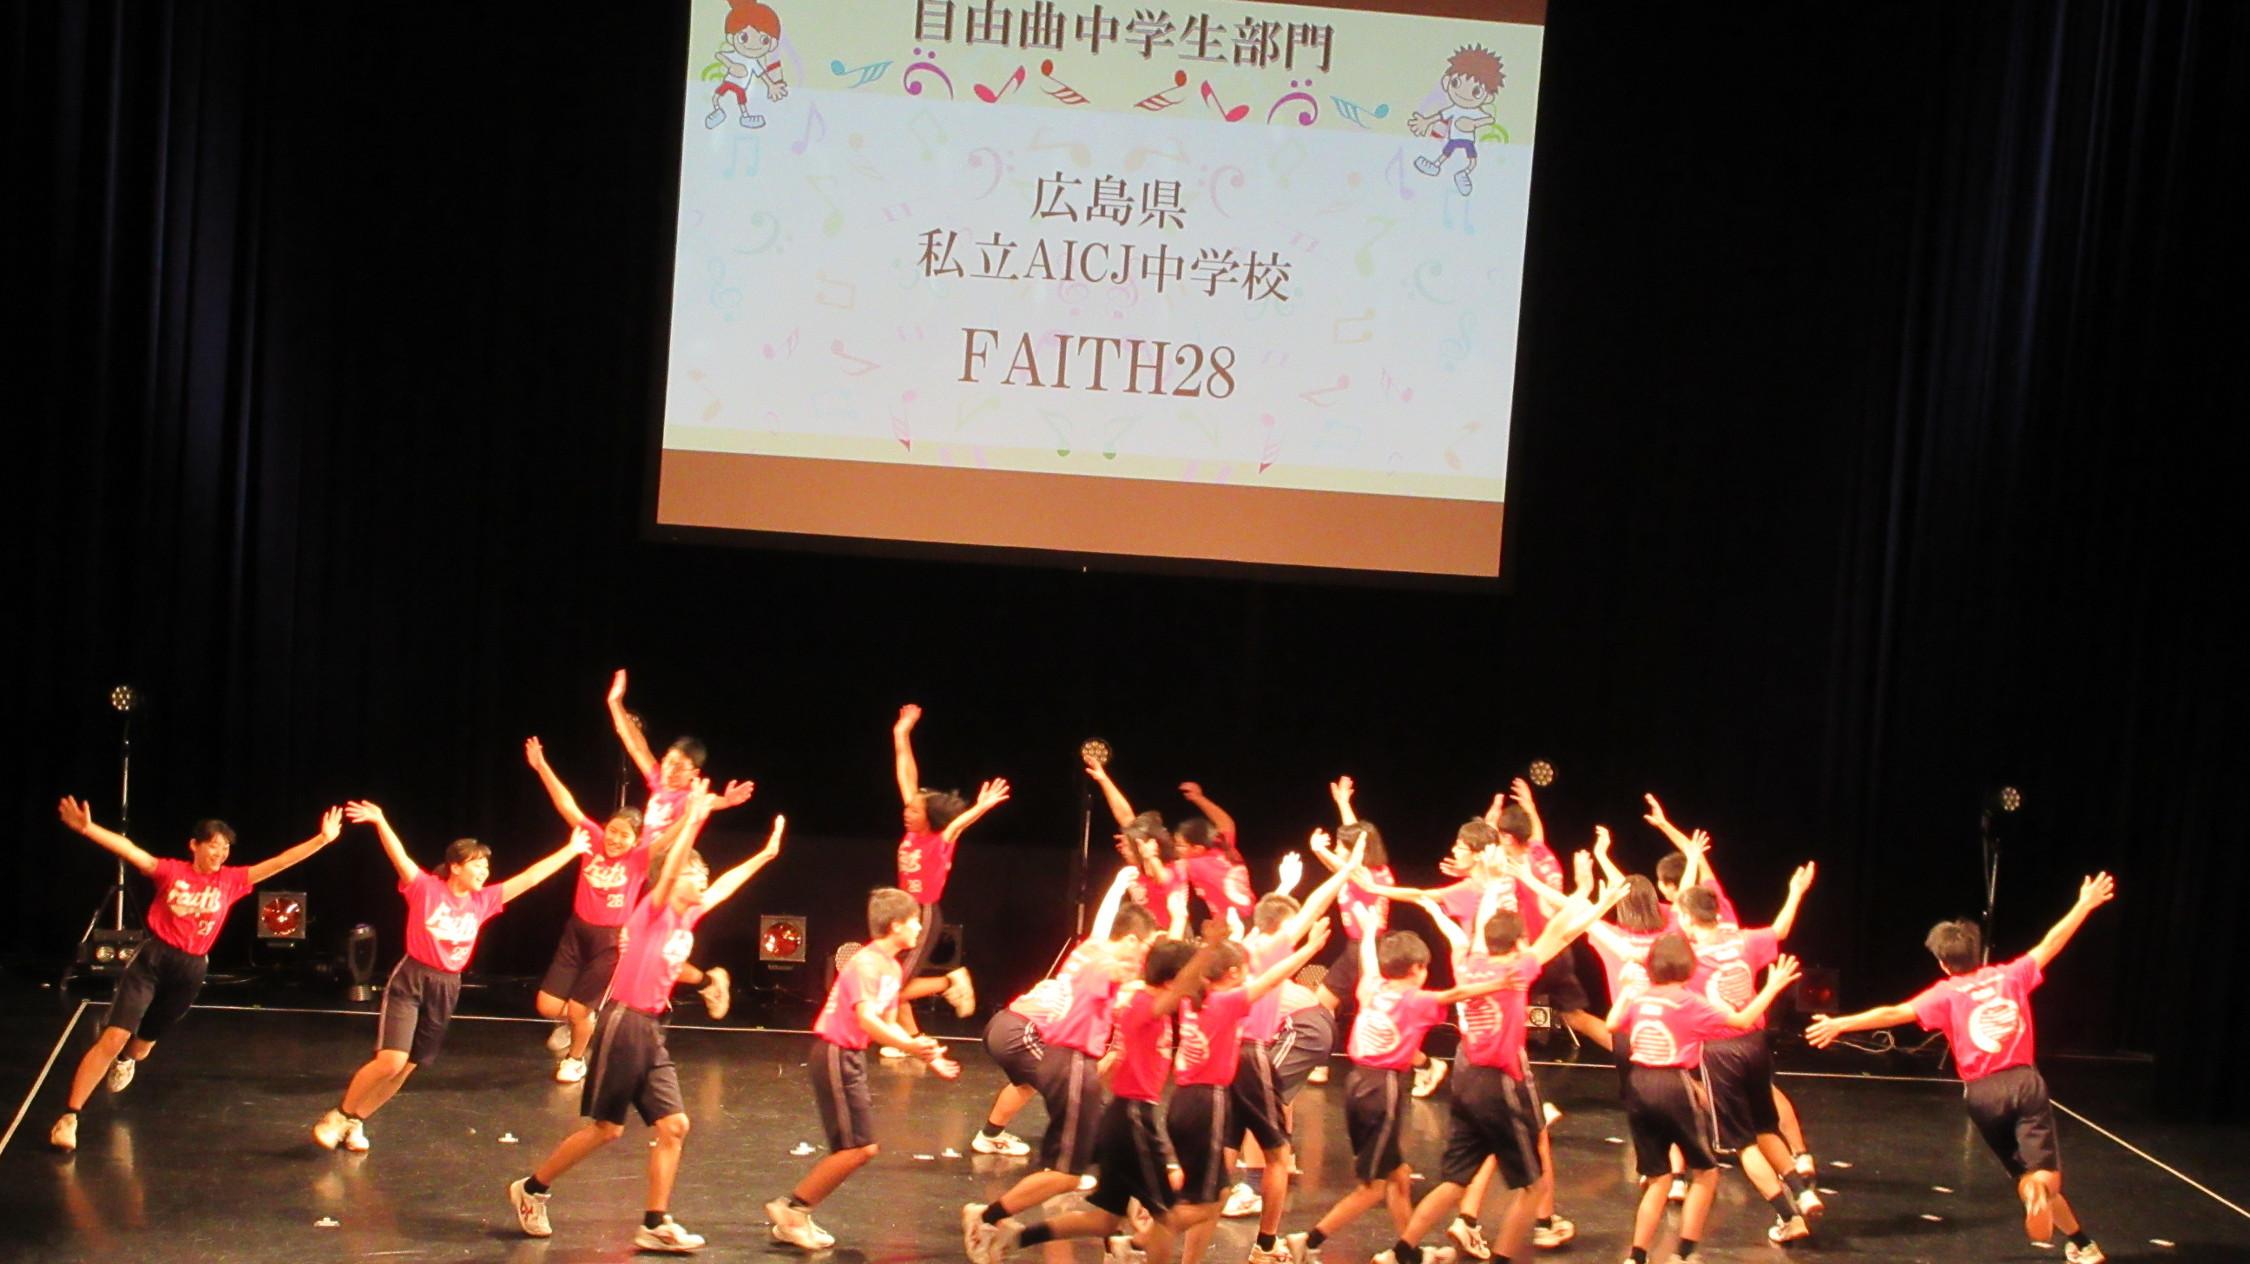 中学リズムダンス全国大会 自由曲部門出場